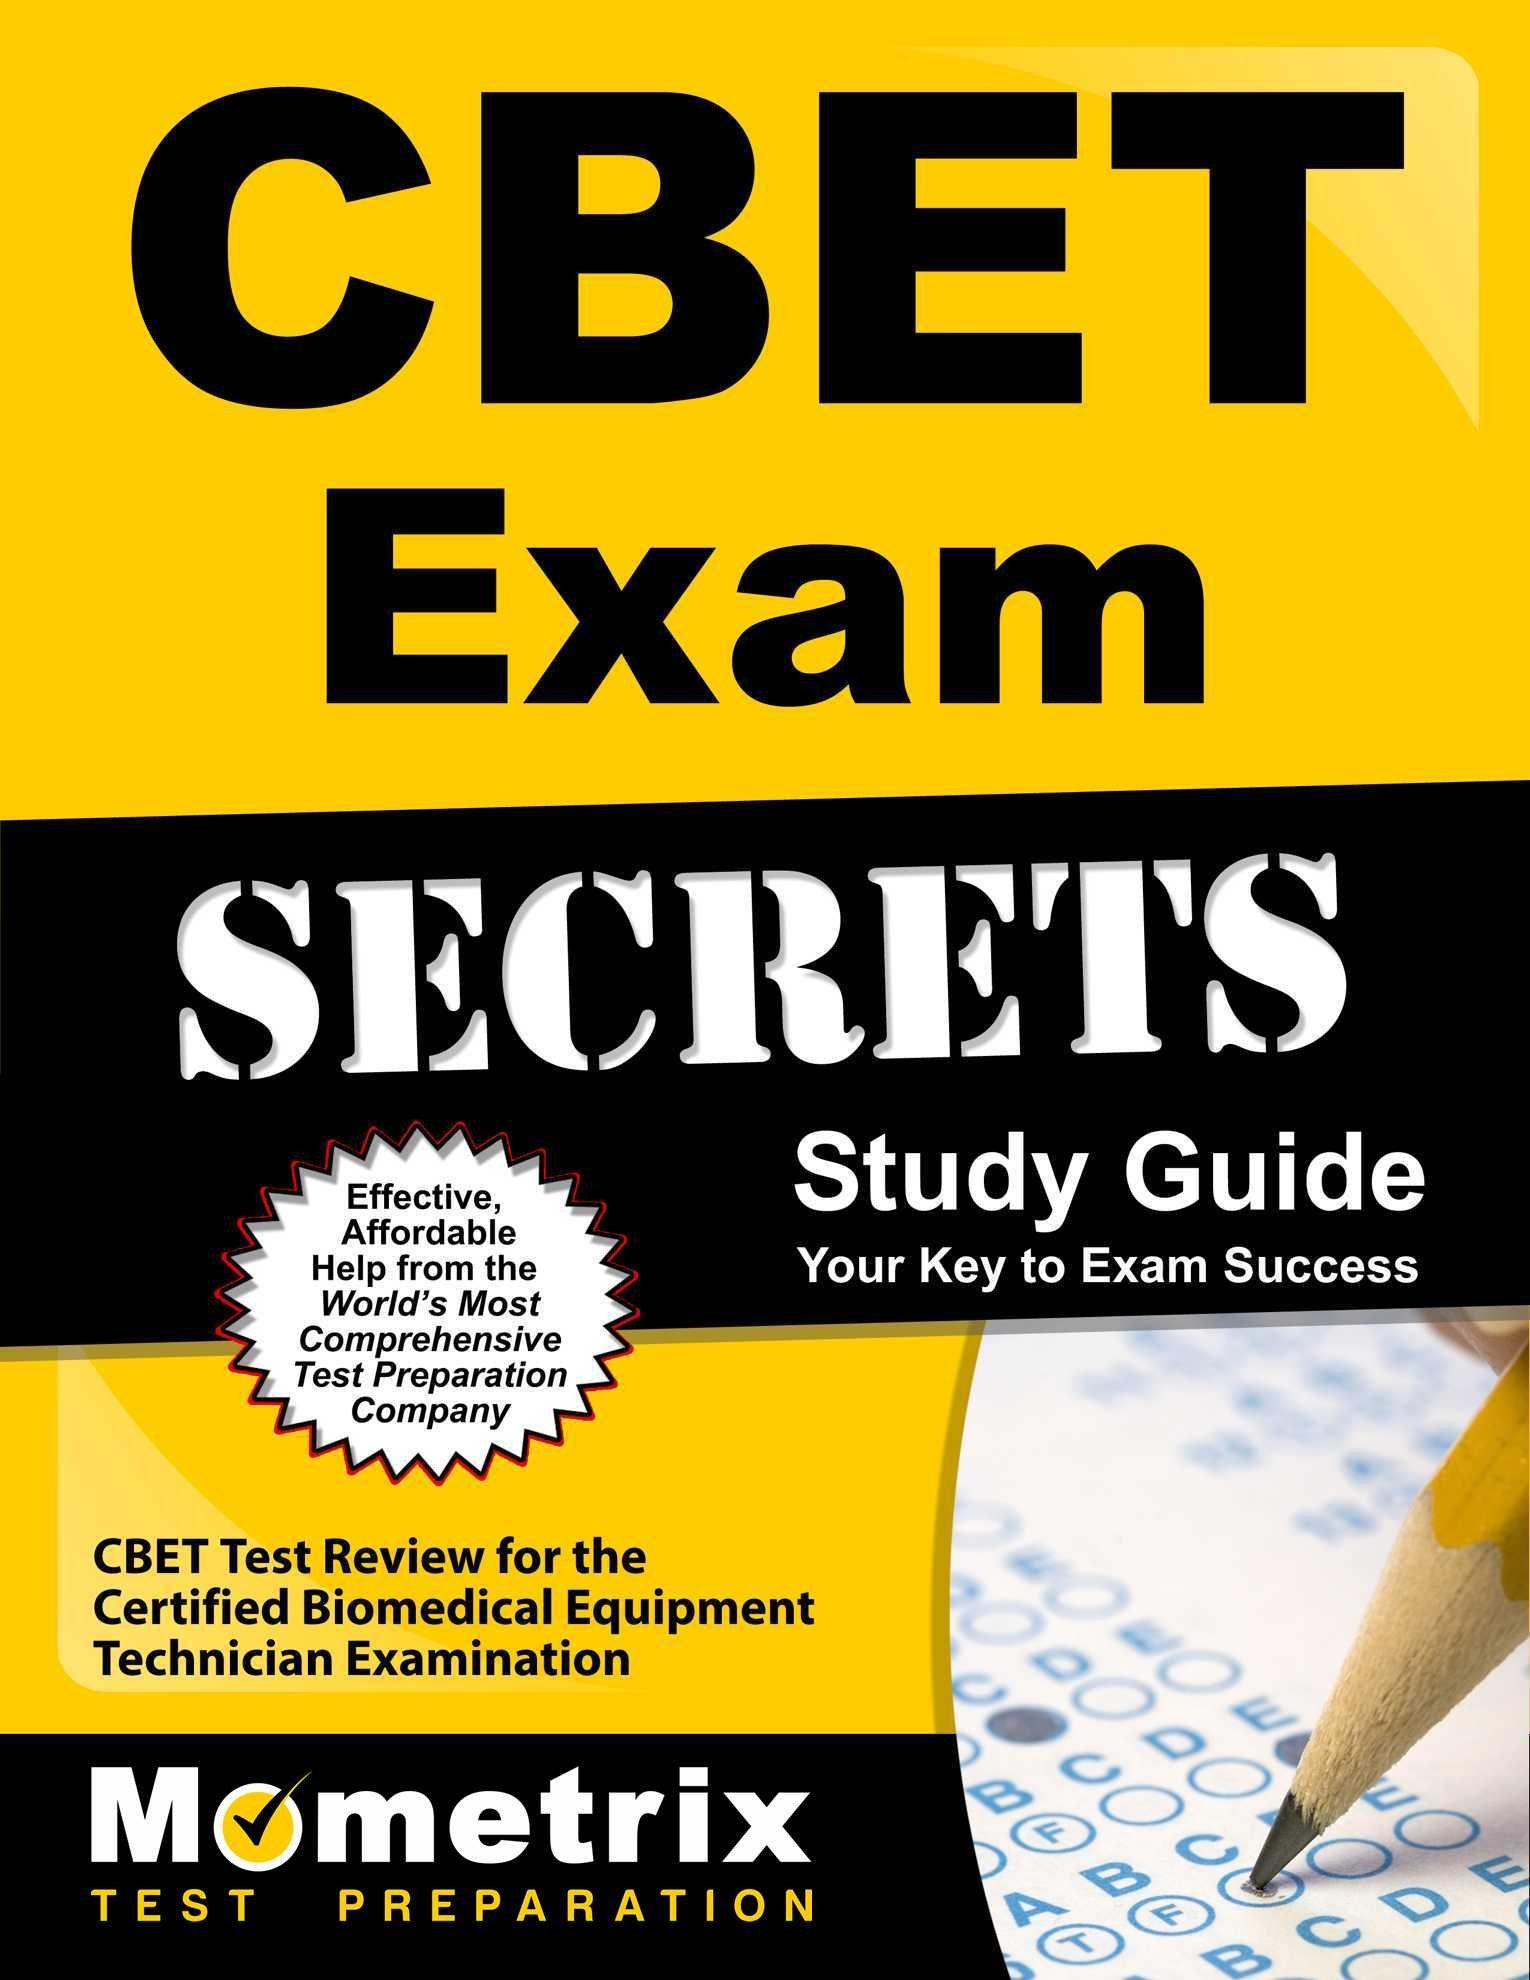 Buy Cbet Exam Secrets Cbet Test Review For The Certified Biomedical